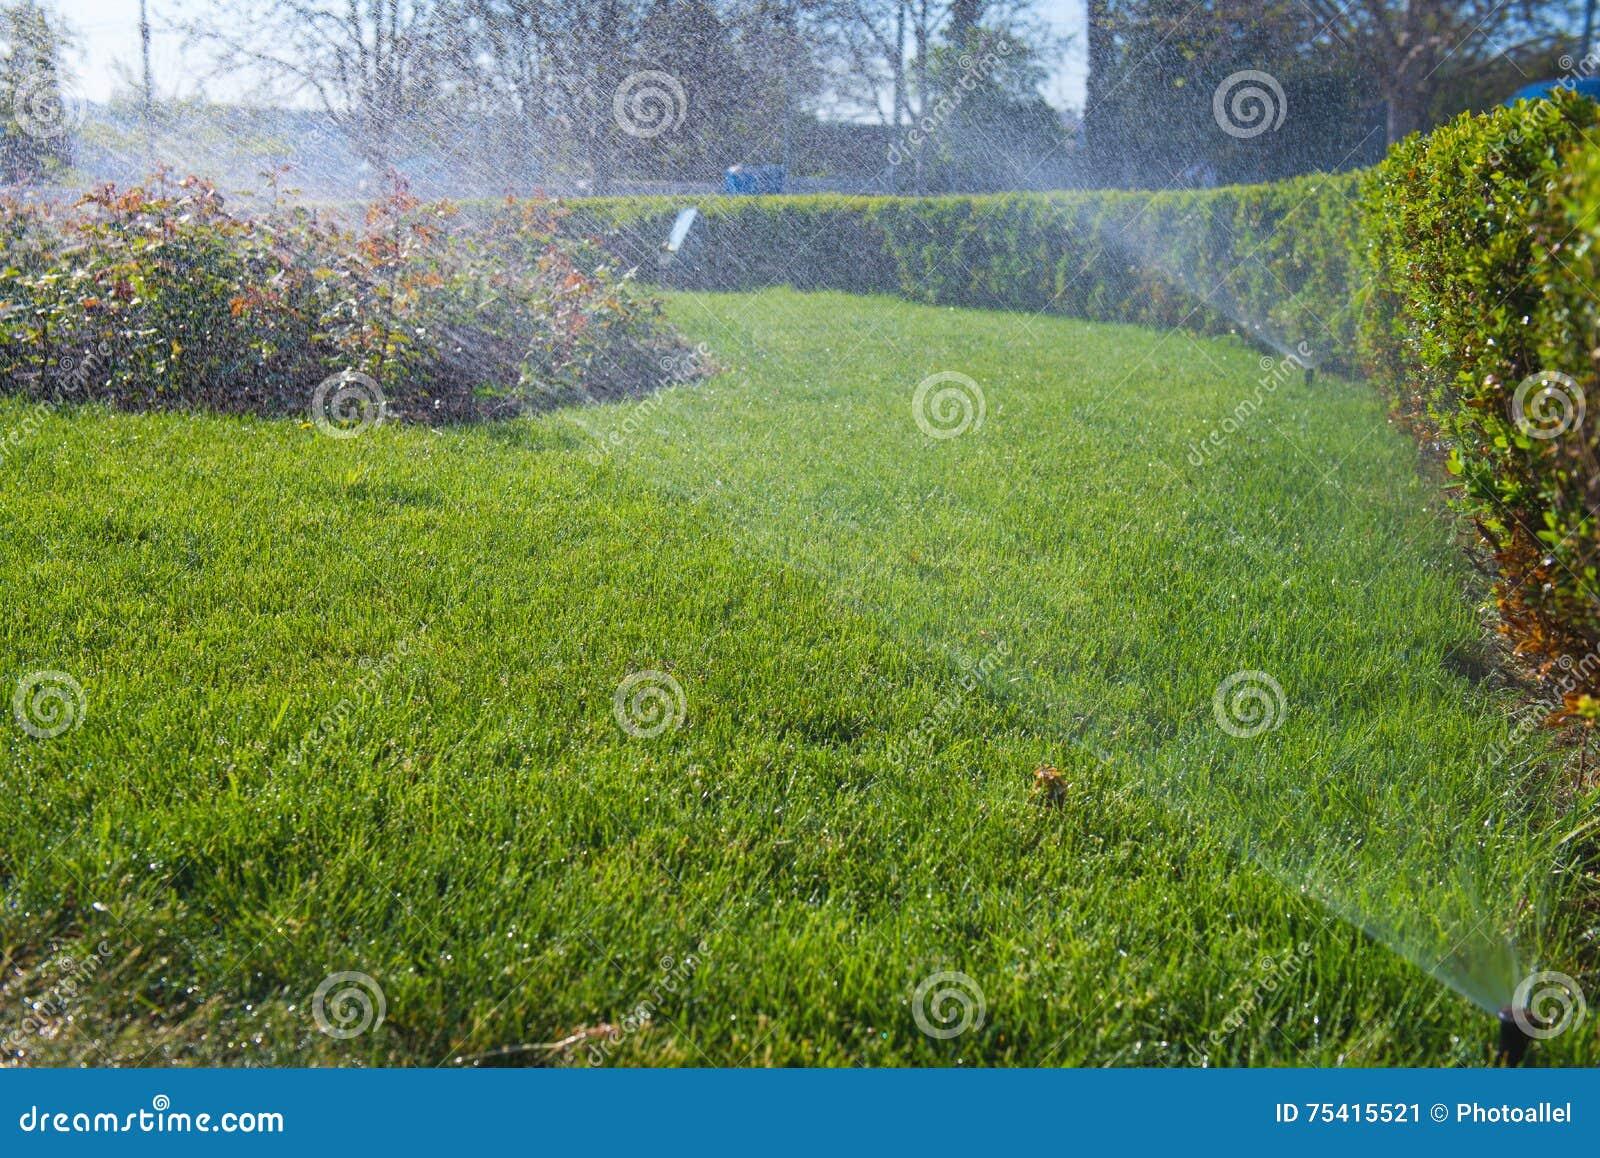 Gras In Tuin : Groen gras gras tuin in ochtend u stockfoto sutichak